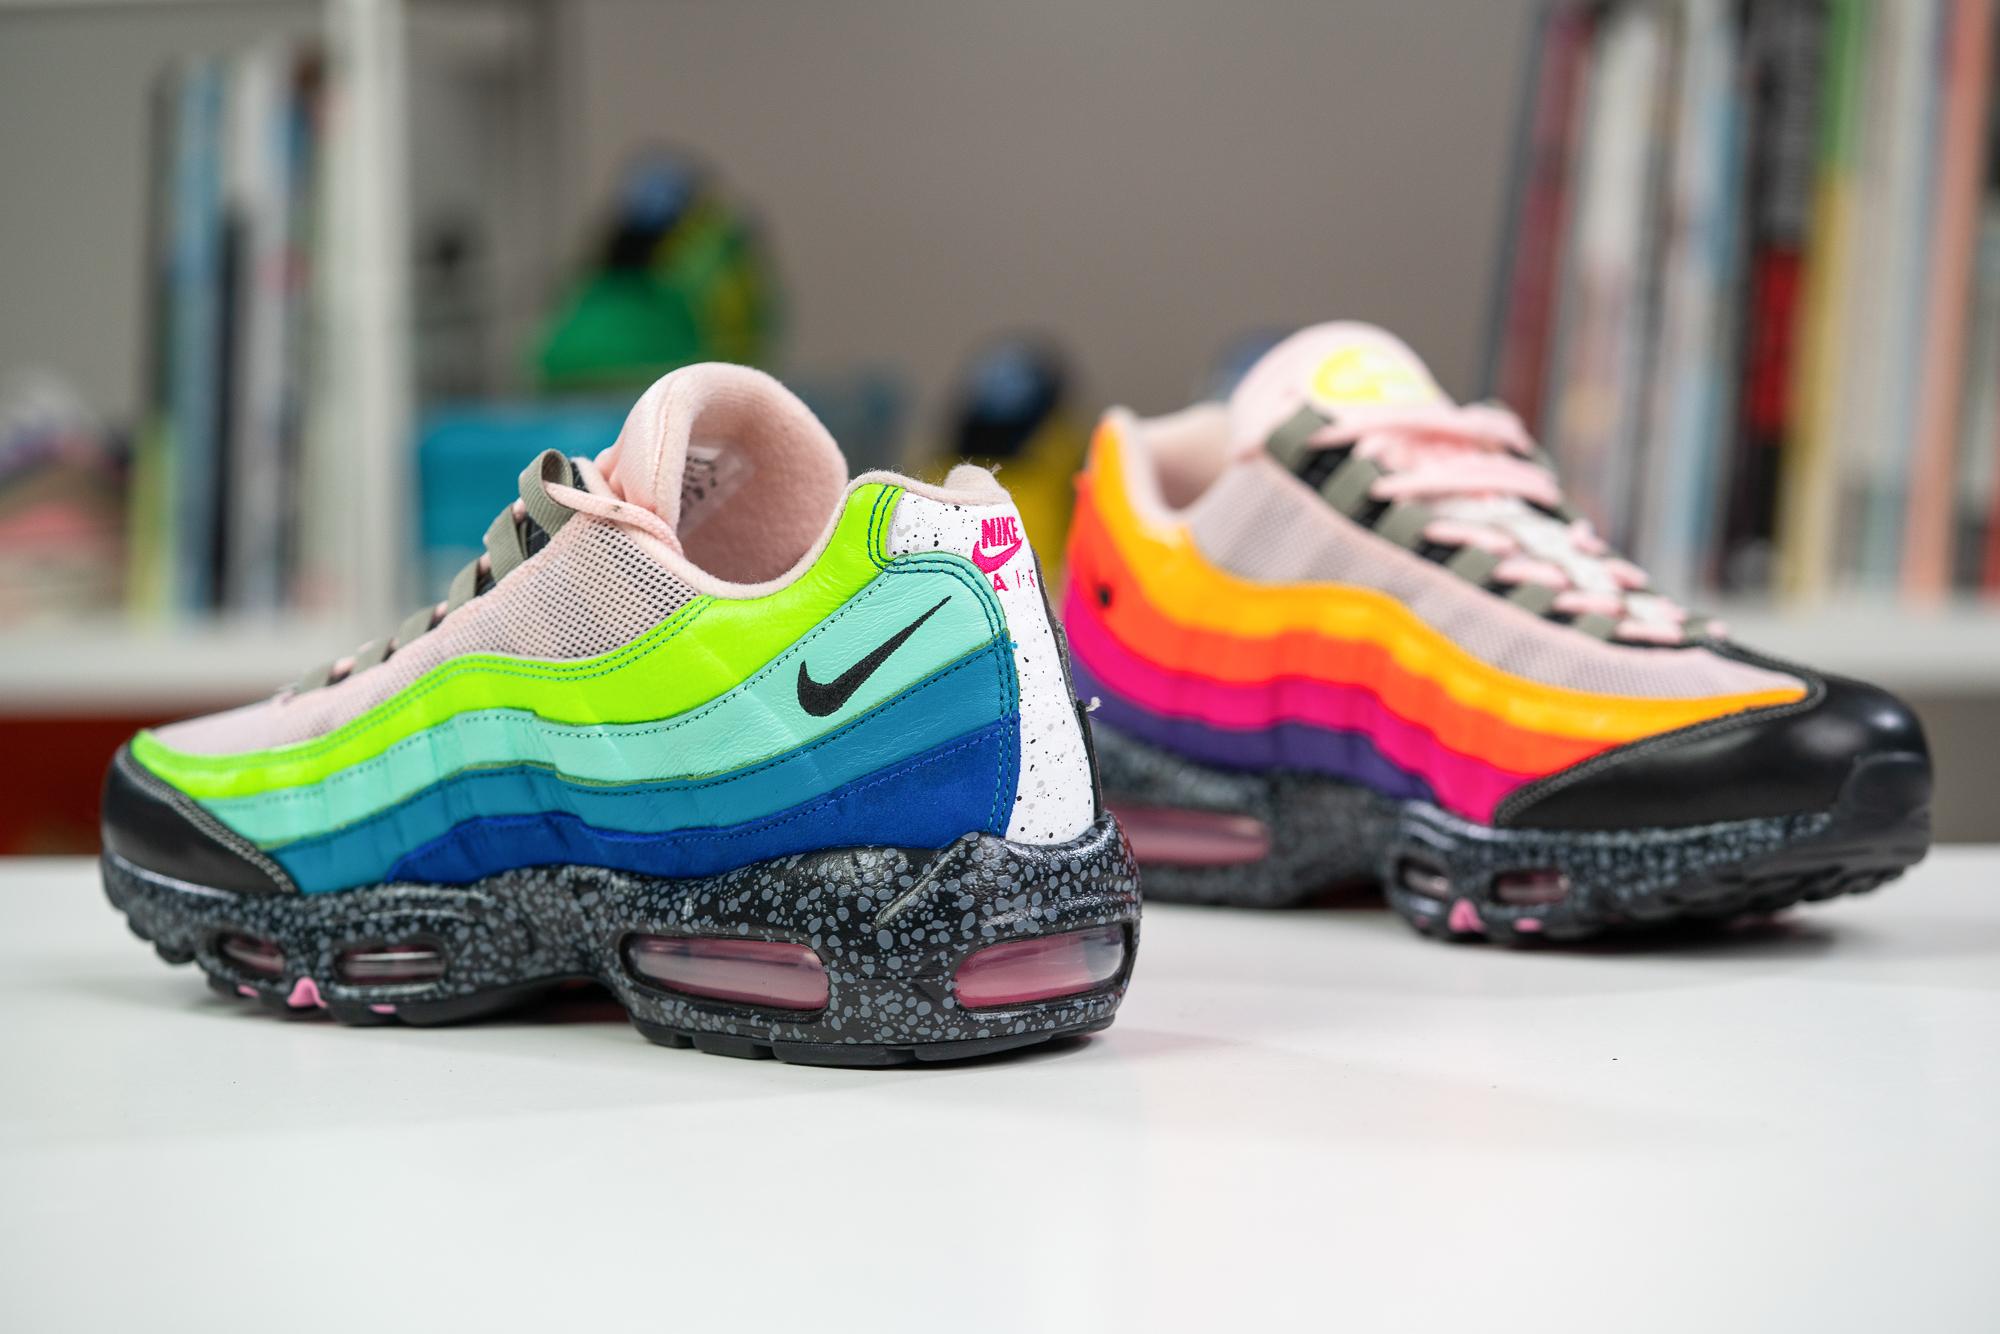 Nike Air Max 95 '20 for 20', PUMA Fast